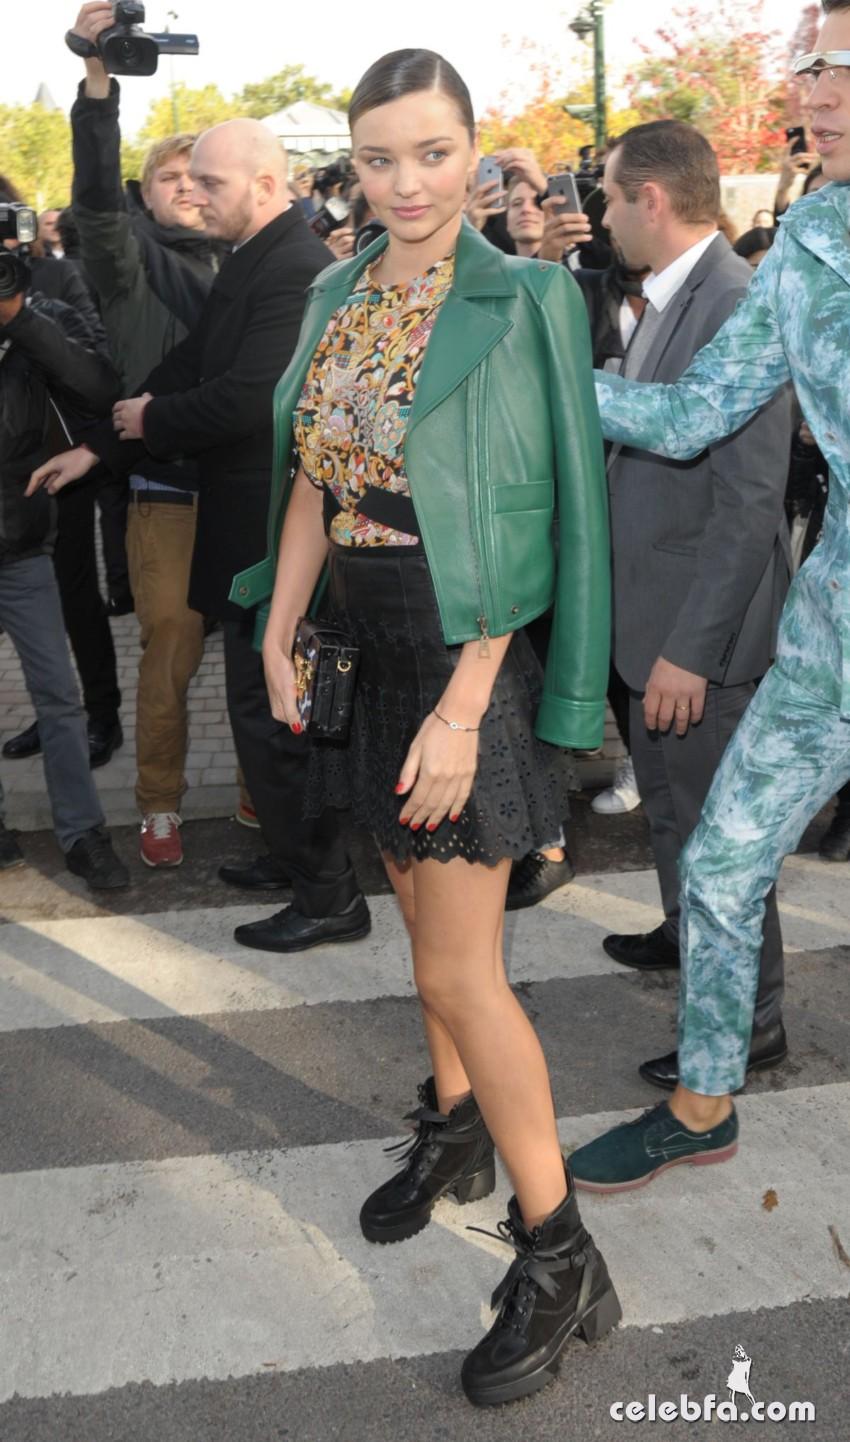 miranda-kerr-at-louis-vuitton-fashion-show-at-paris-fashion-week (3)